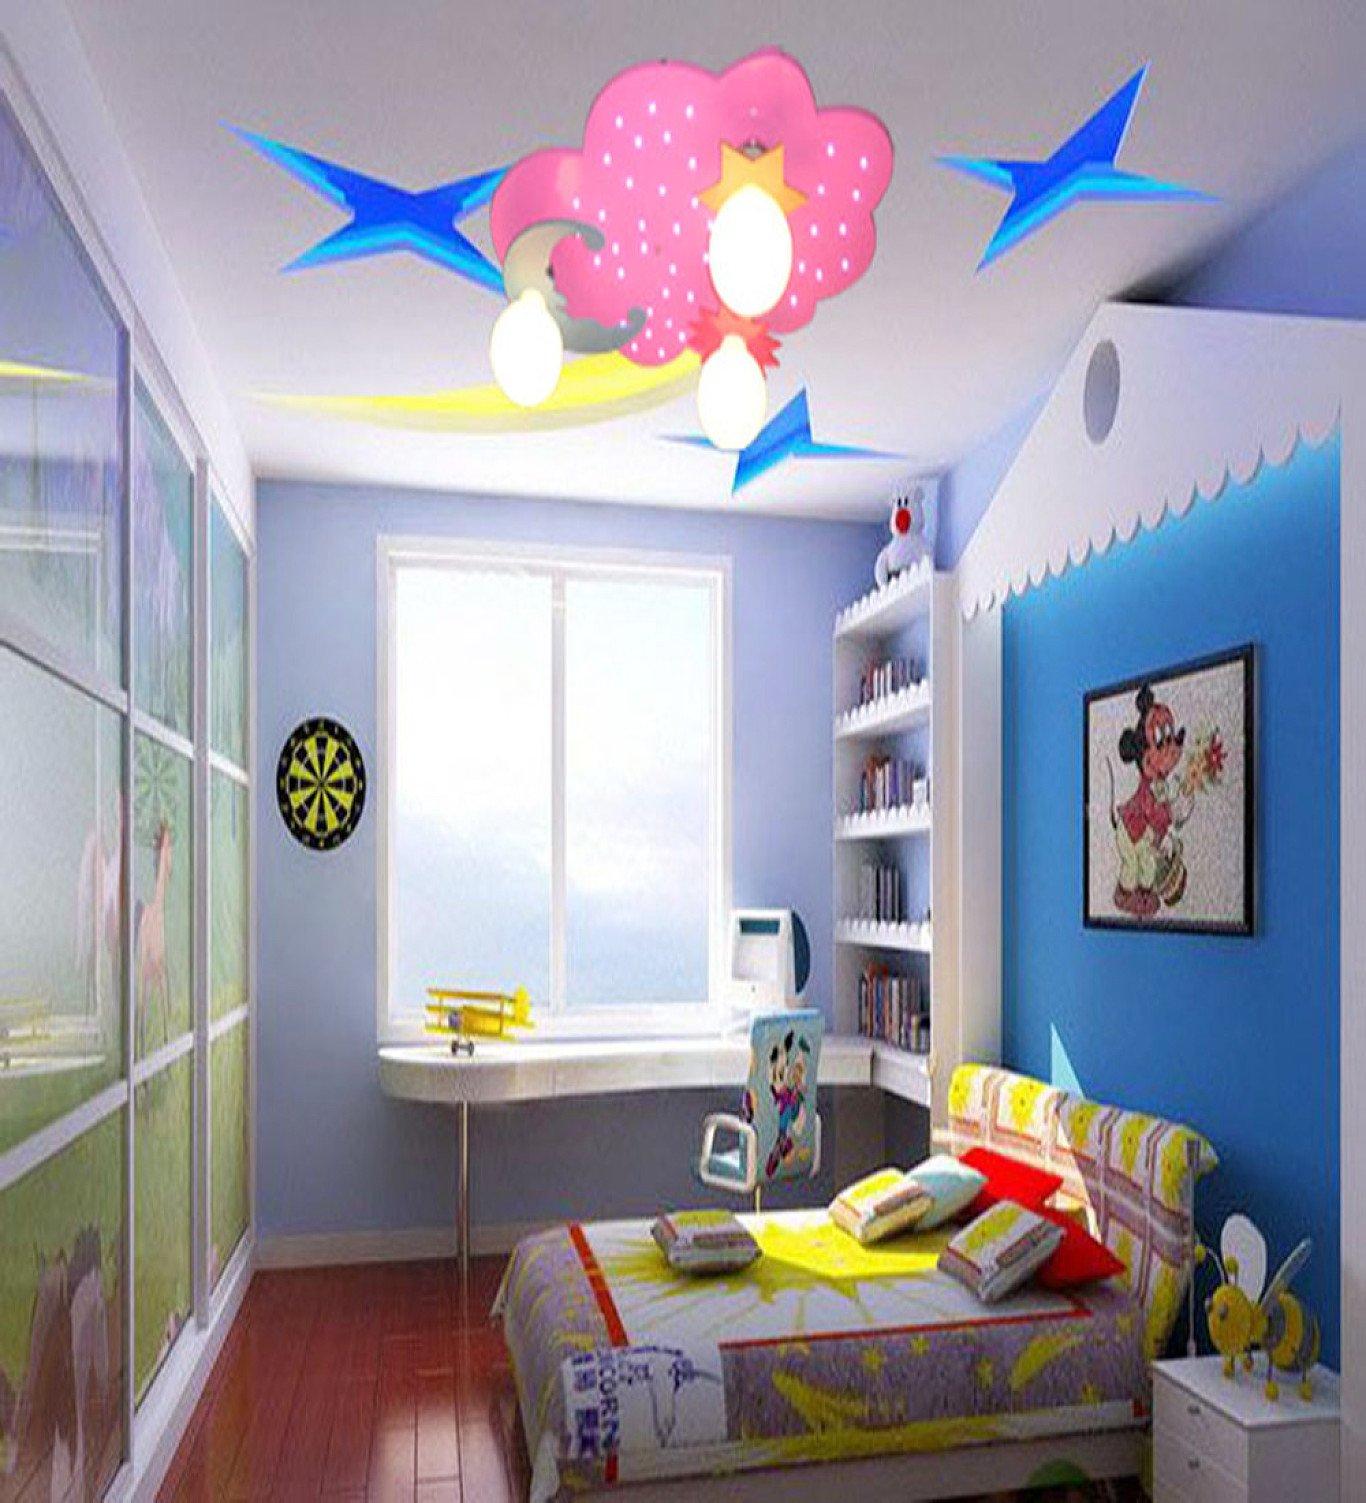 ديكور جبس بورد غرف نوم 2020 10